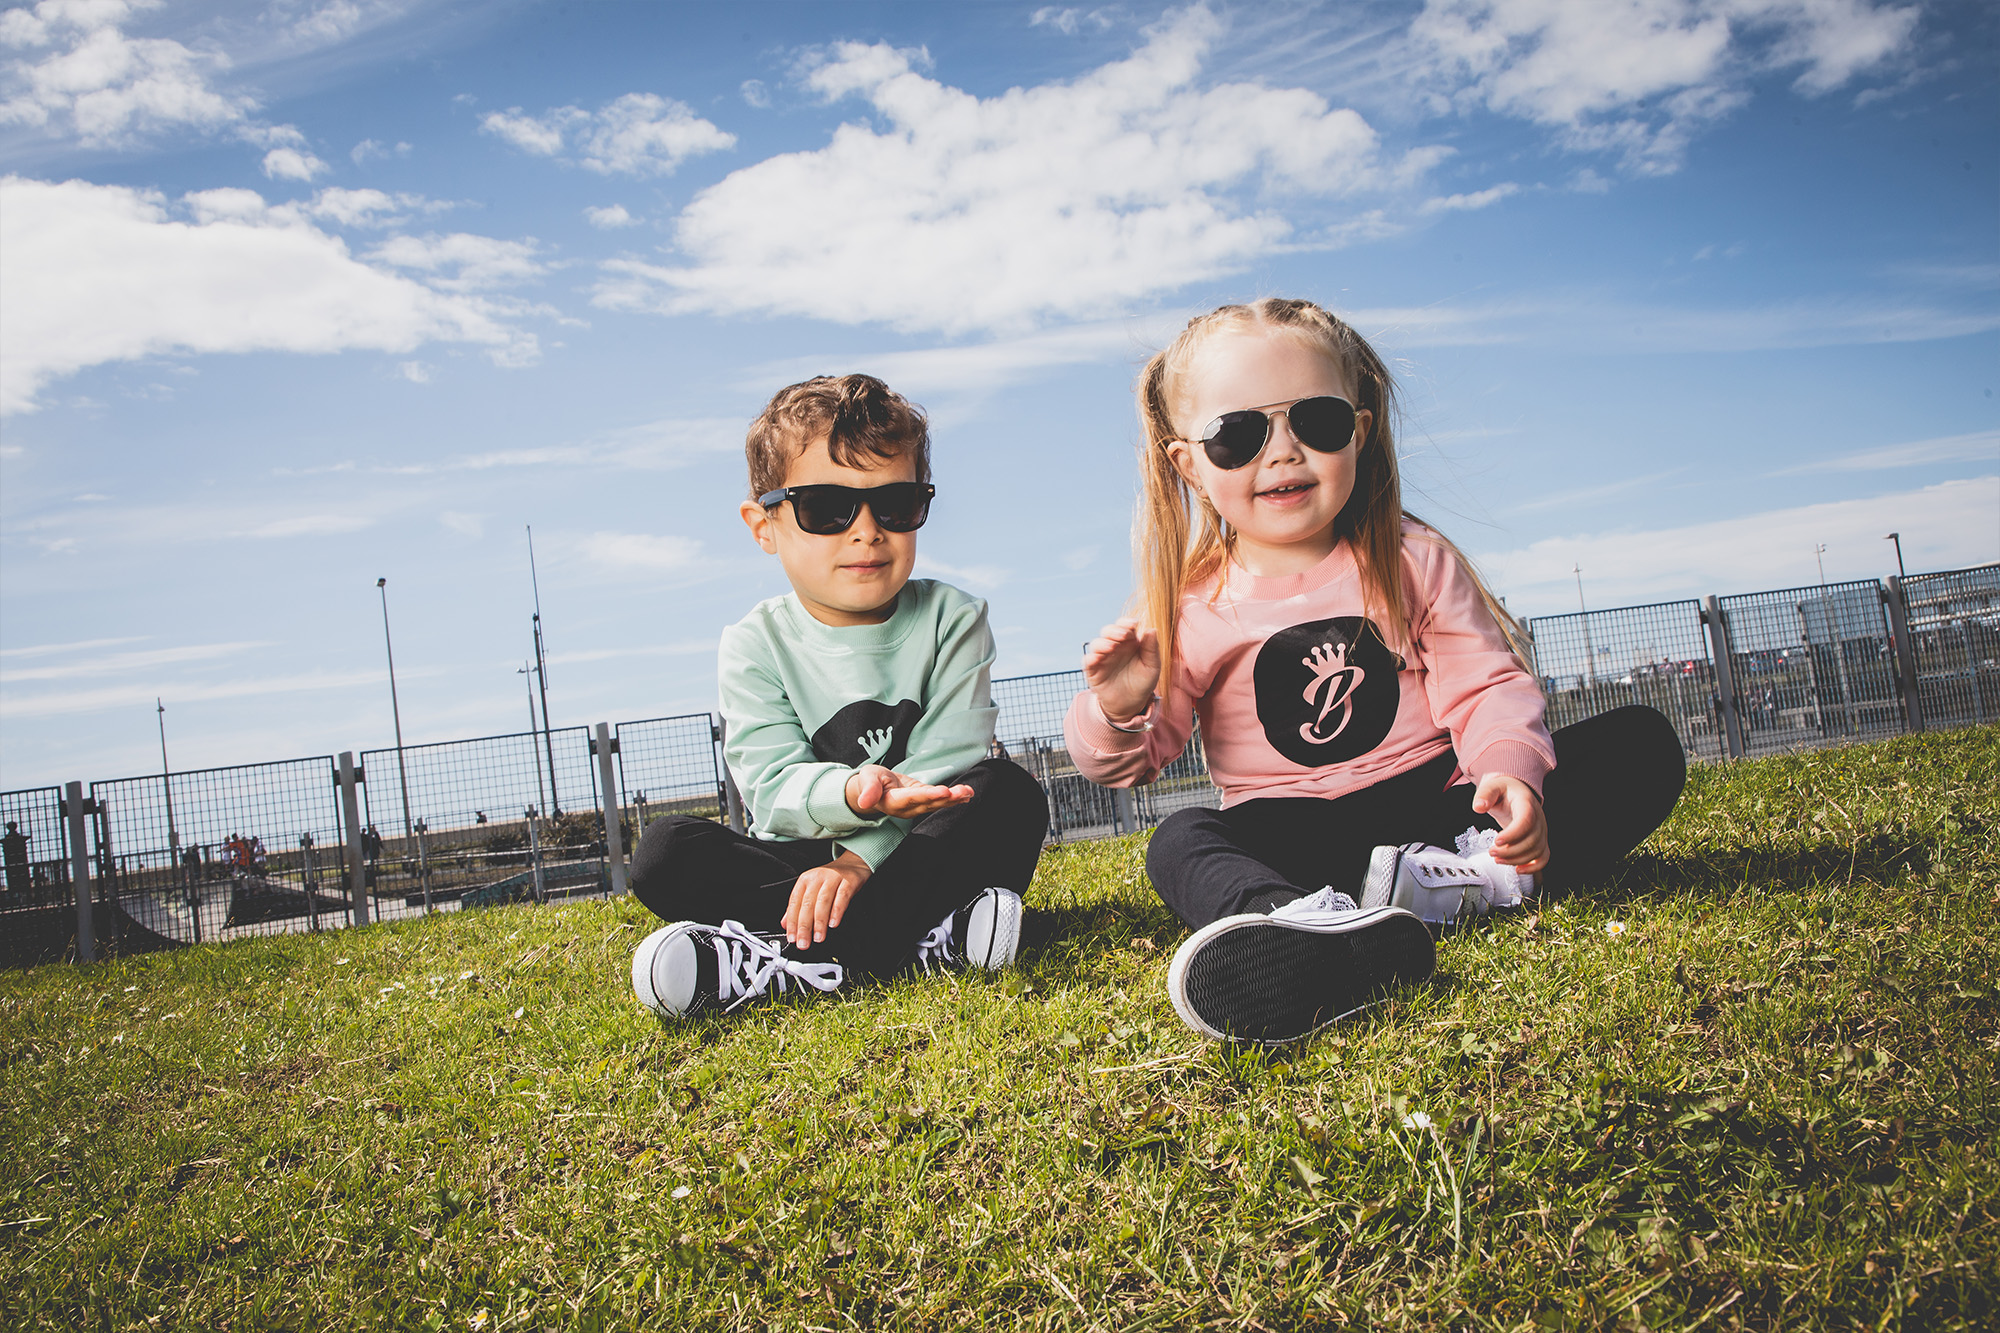 Kids sitting on grass